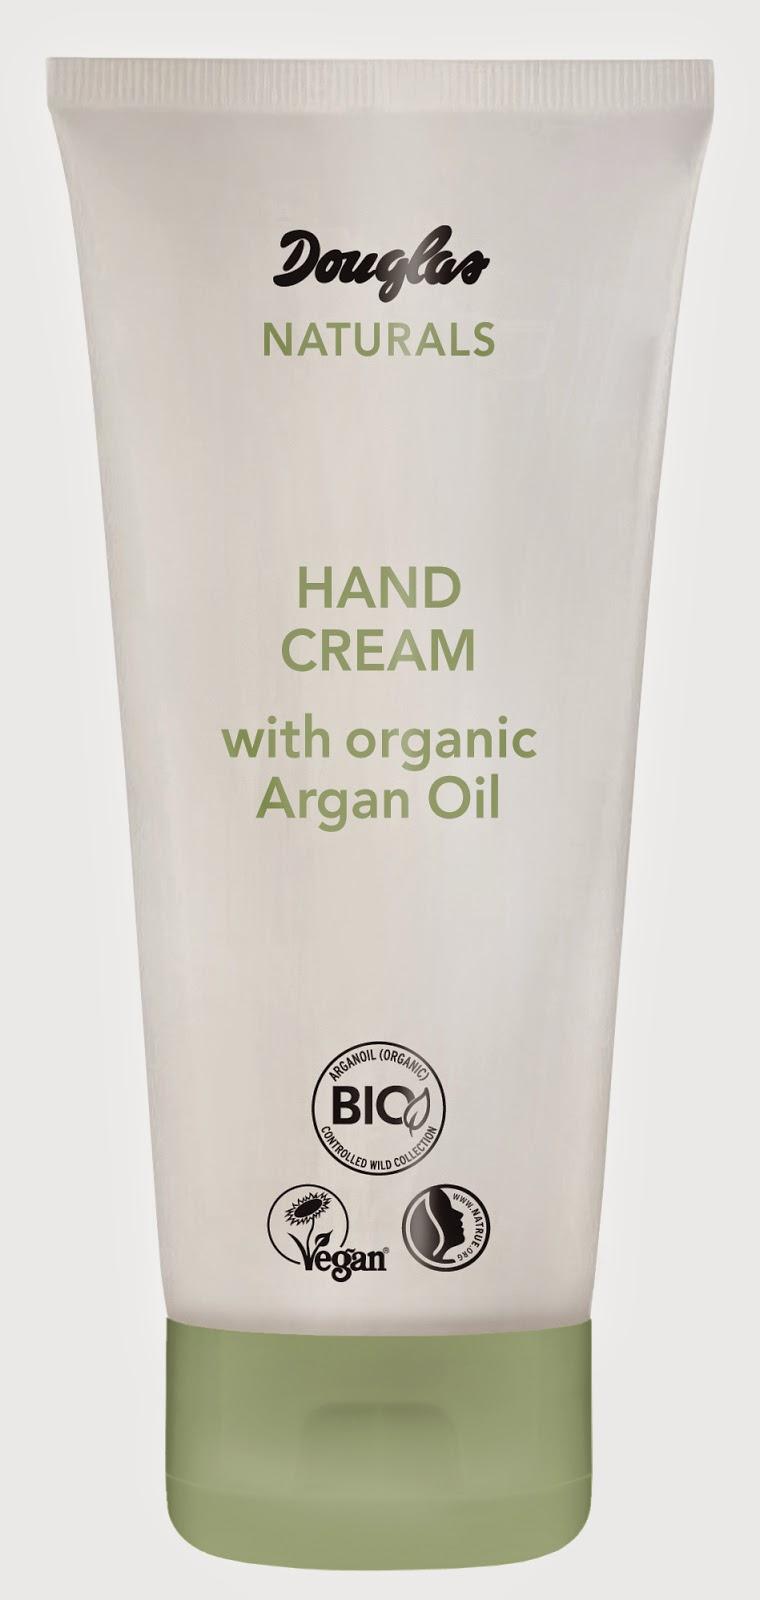 Douglas Naturals Hand Cream